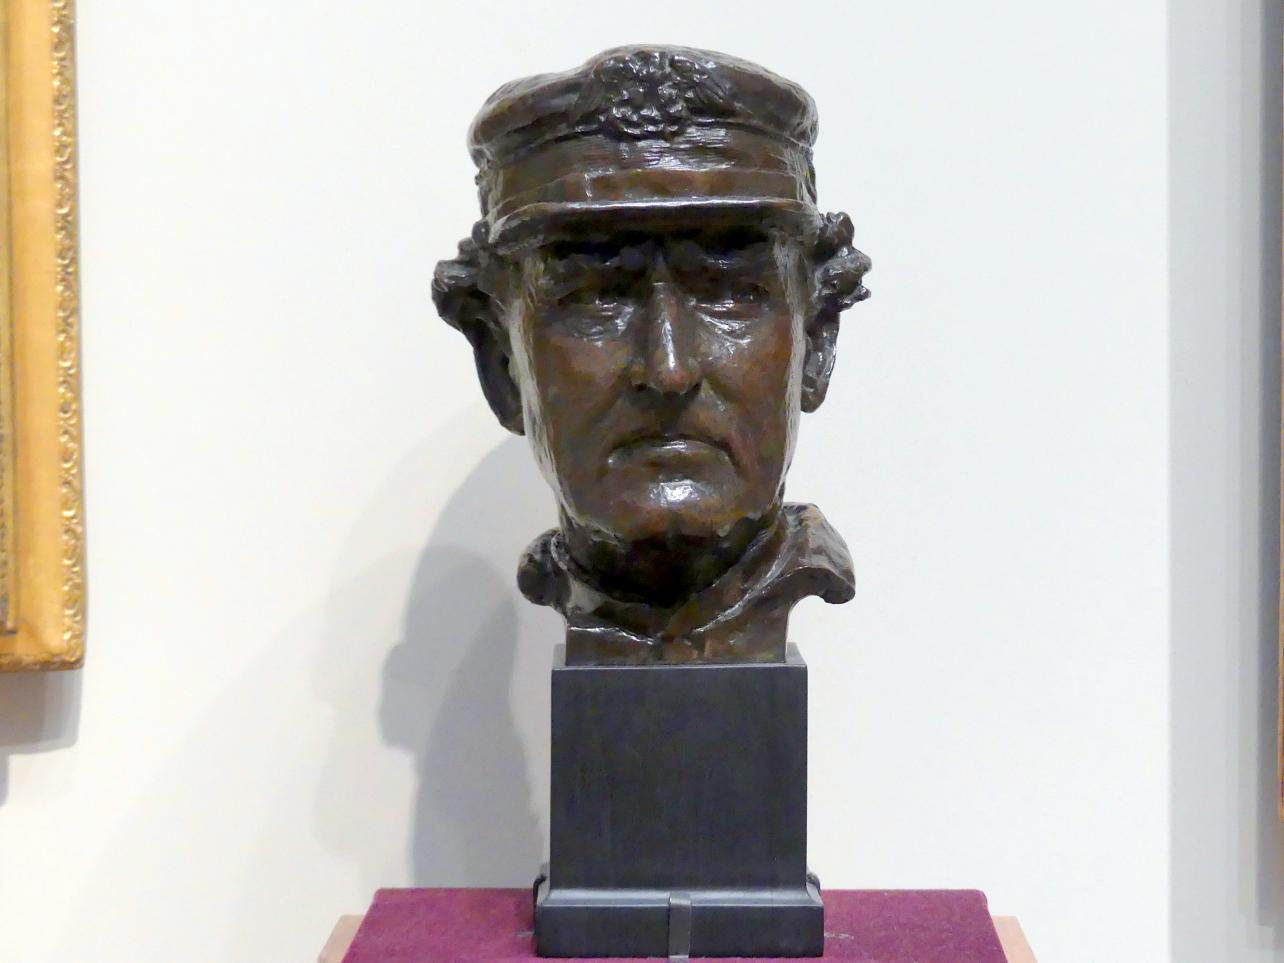 Augustus Saint-Gaudens: Admiral David Glasgow Farragut, 1879 - 1880